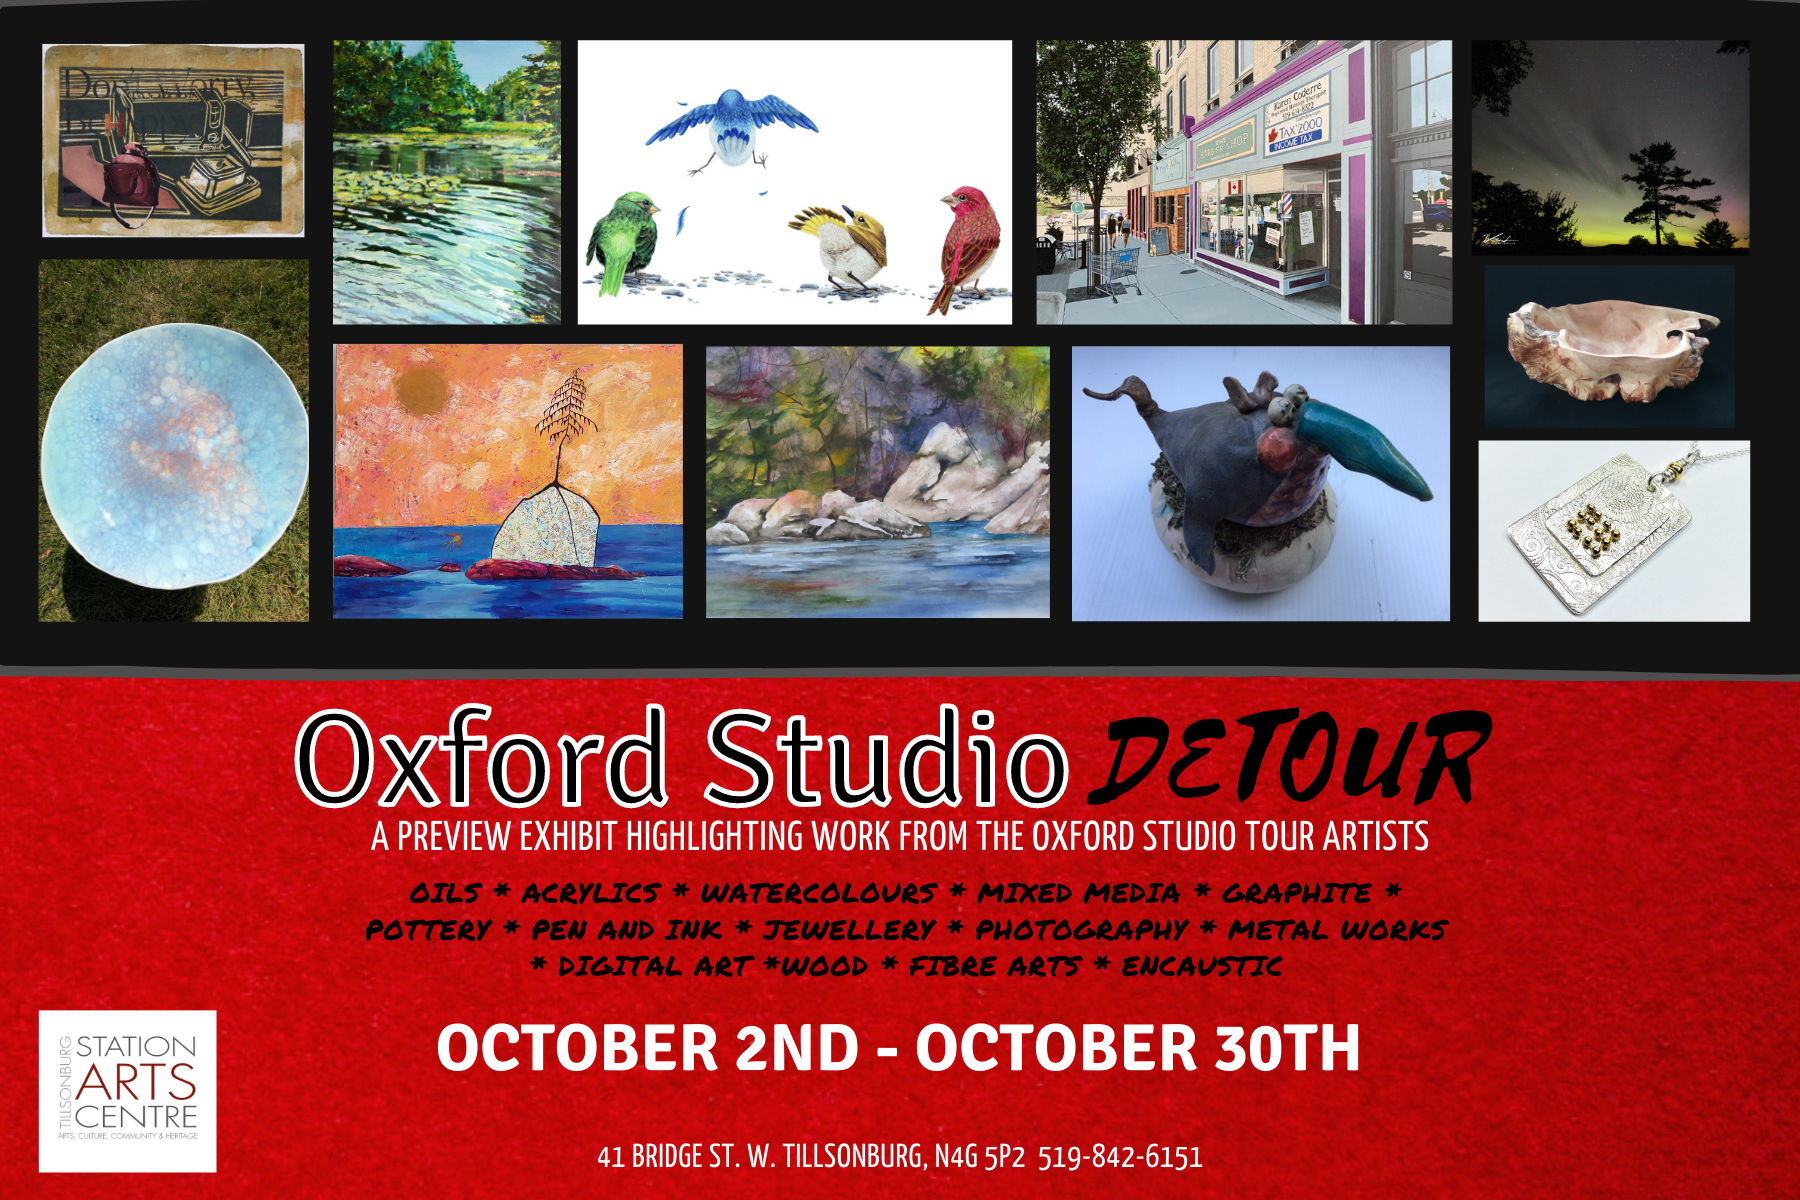 Oxford Studio Detour Invitation